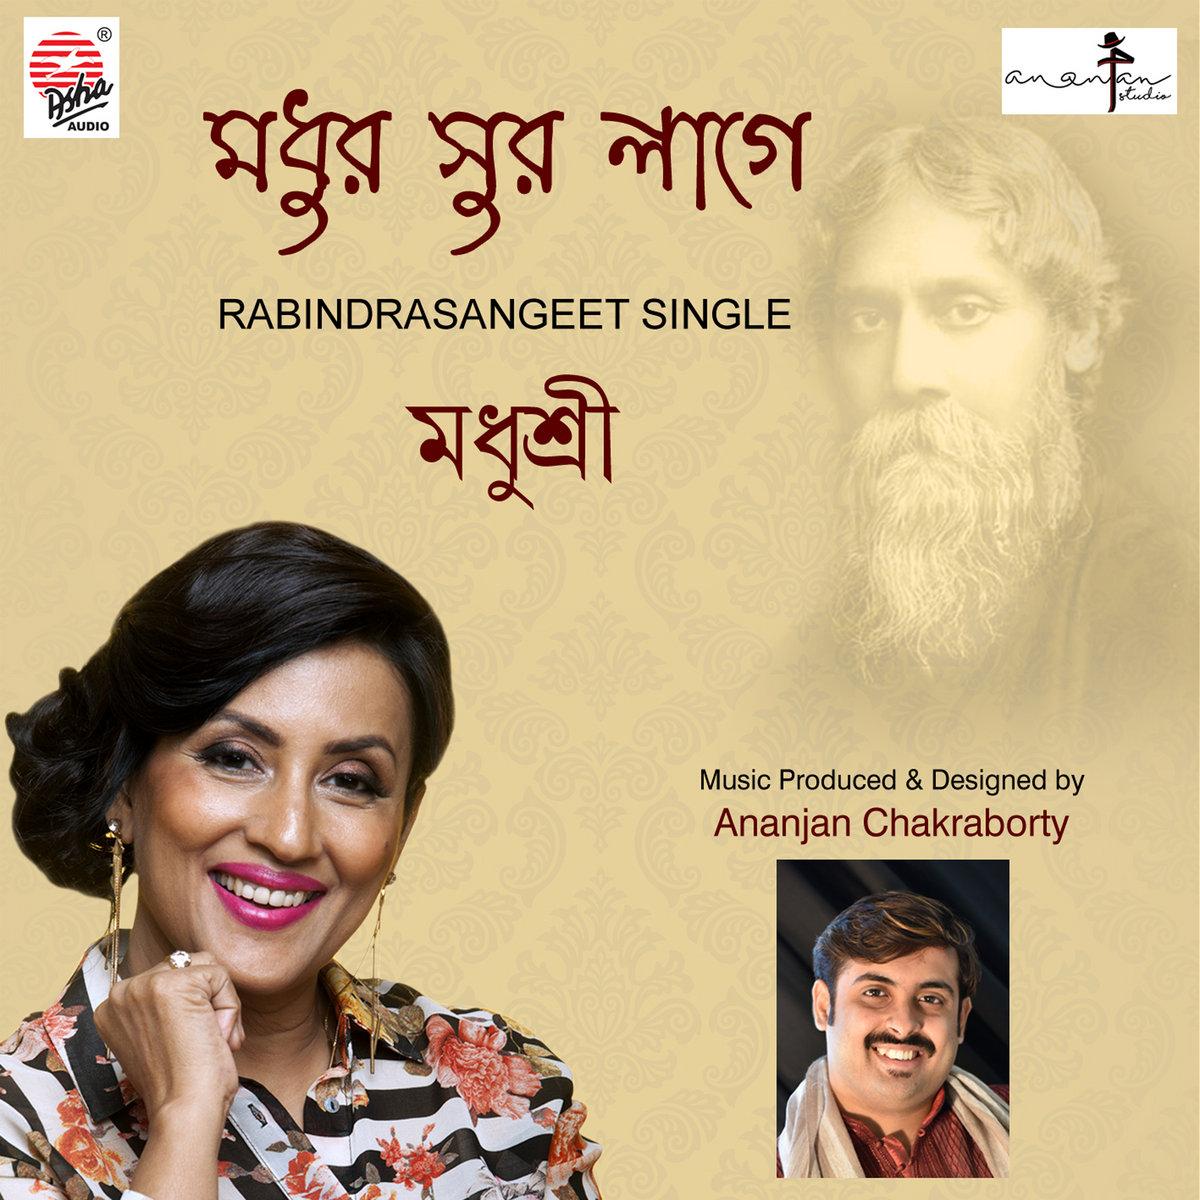 Kyon ki hd mp4 movies in hindi dubbed free download hailitima by perisadha ccuart Gallery